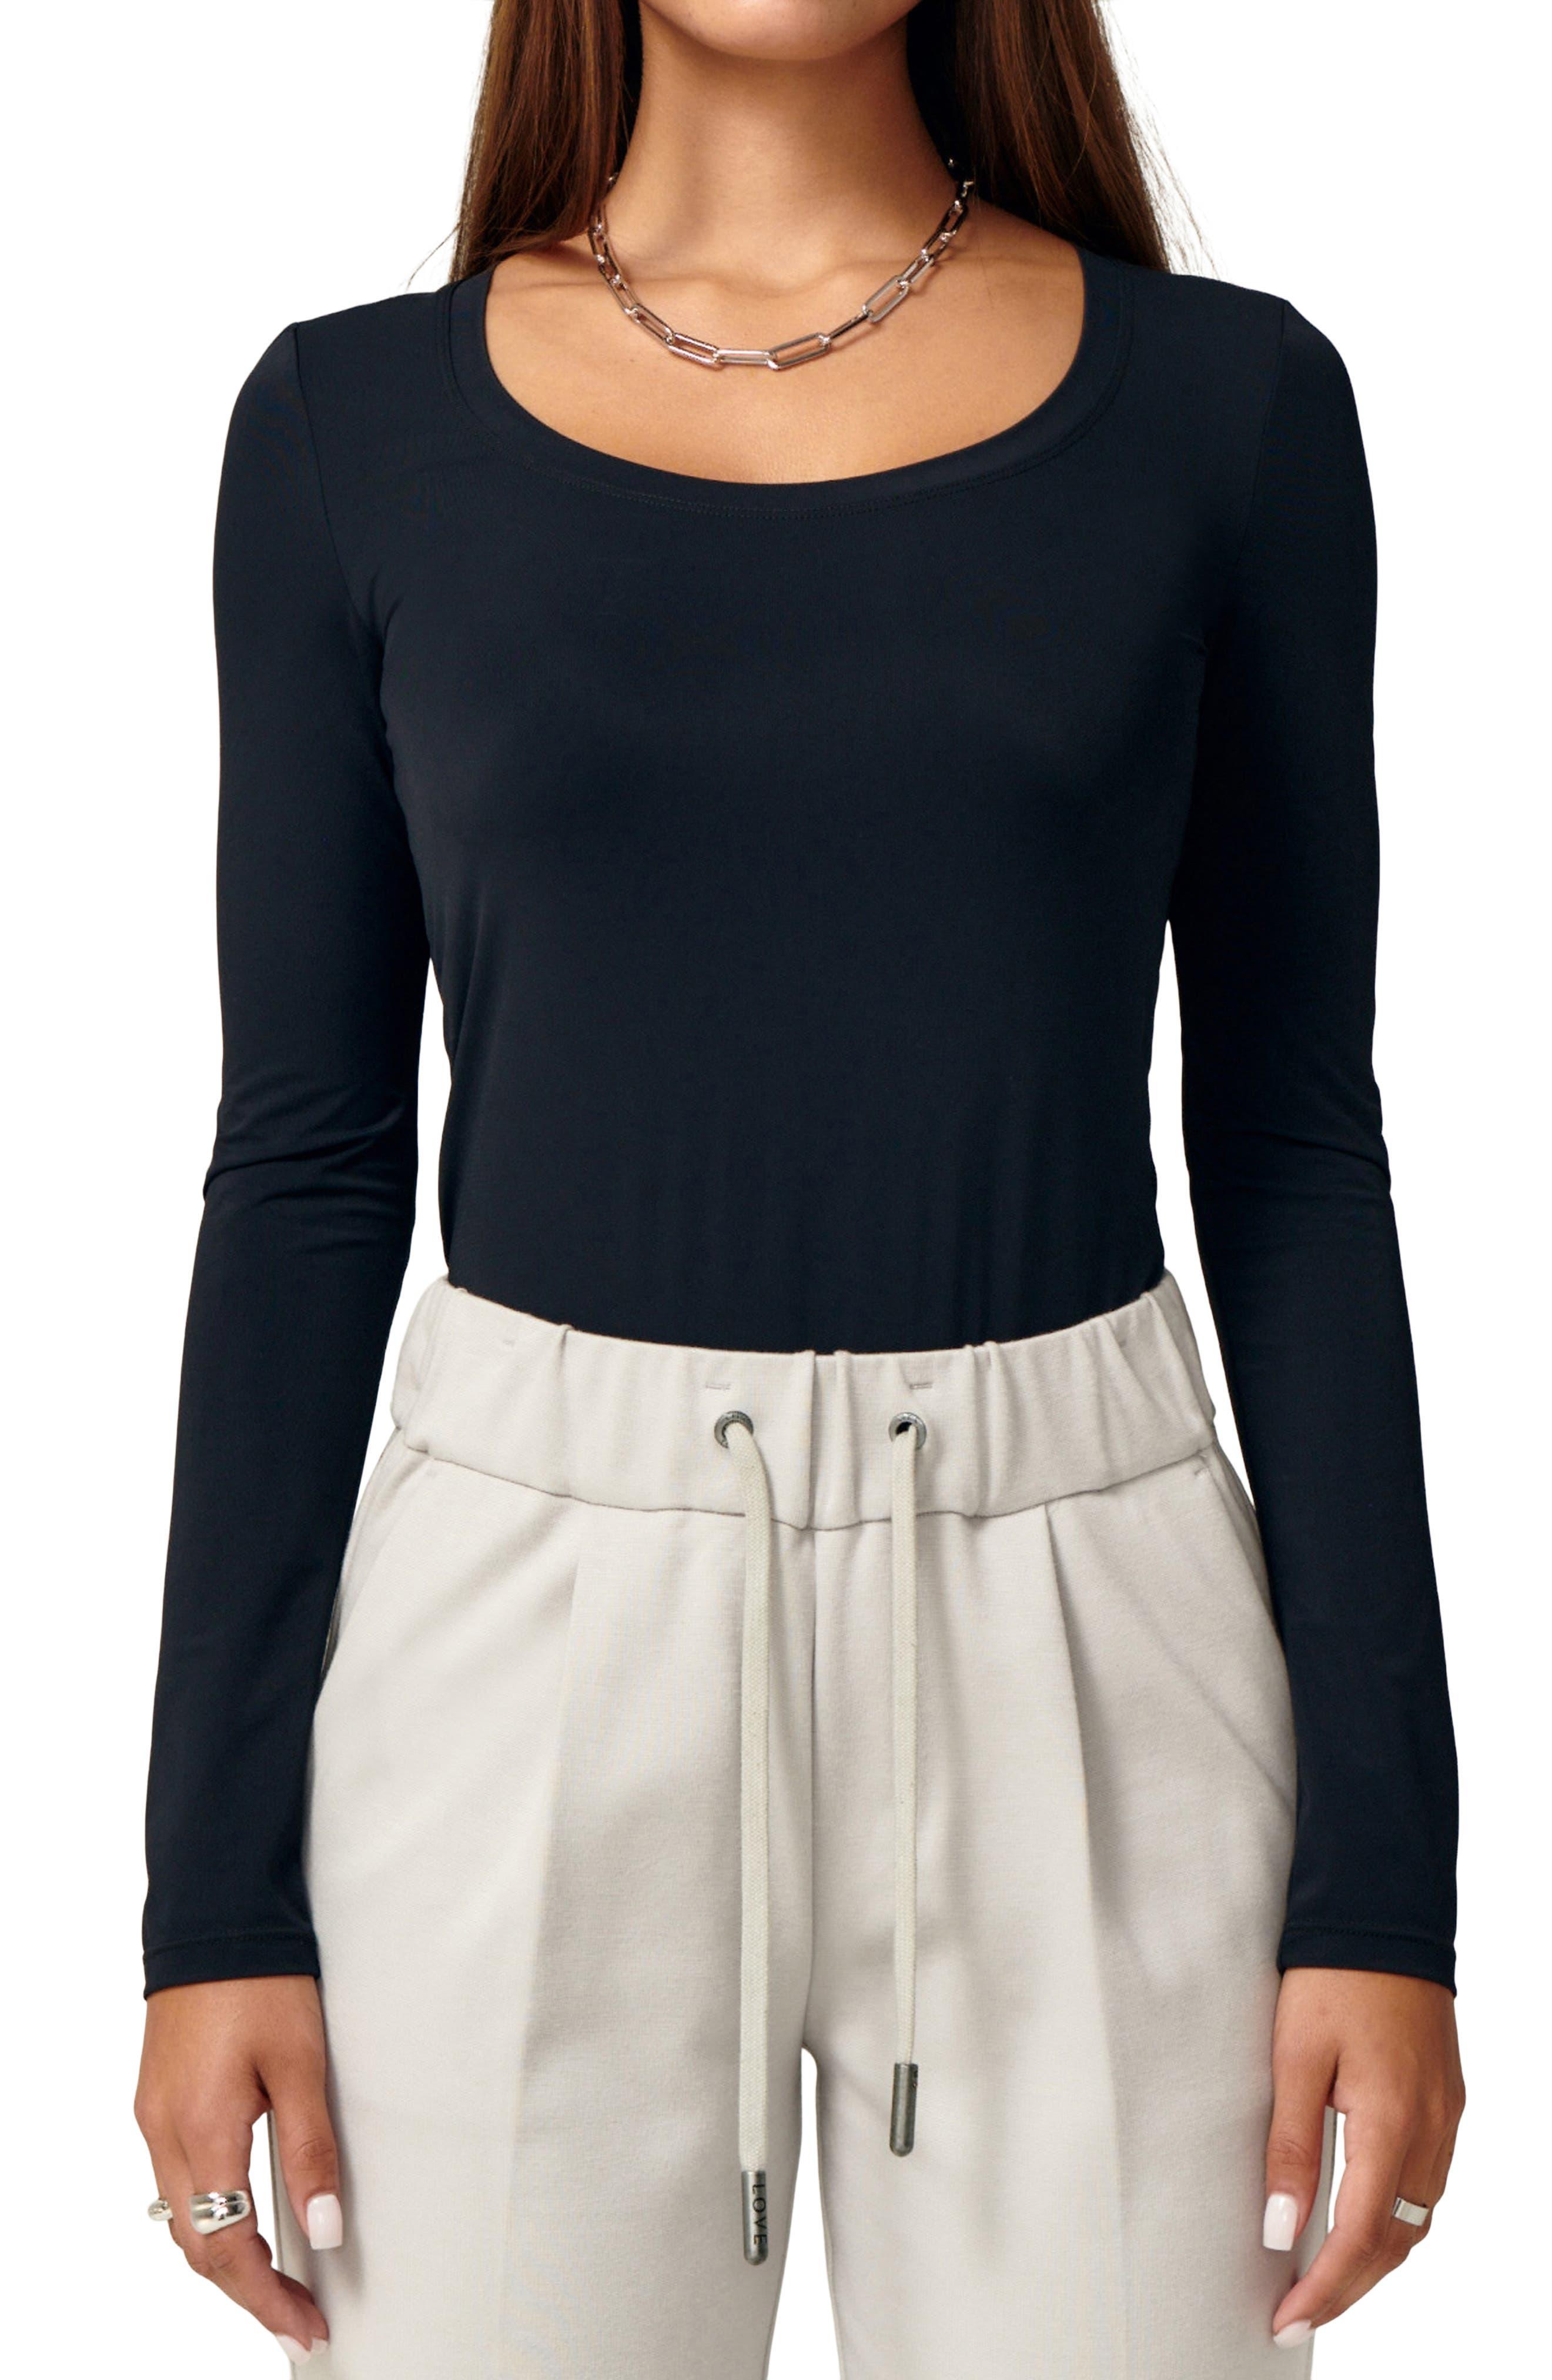 Kiss Long Sleeve Bodysuit